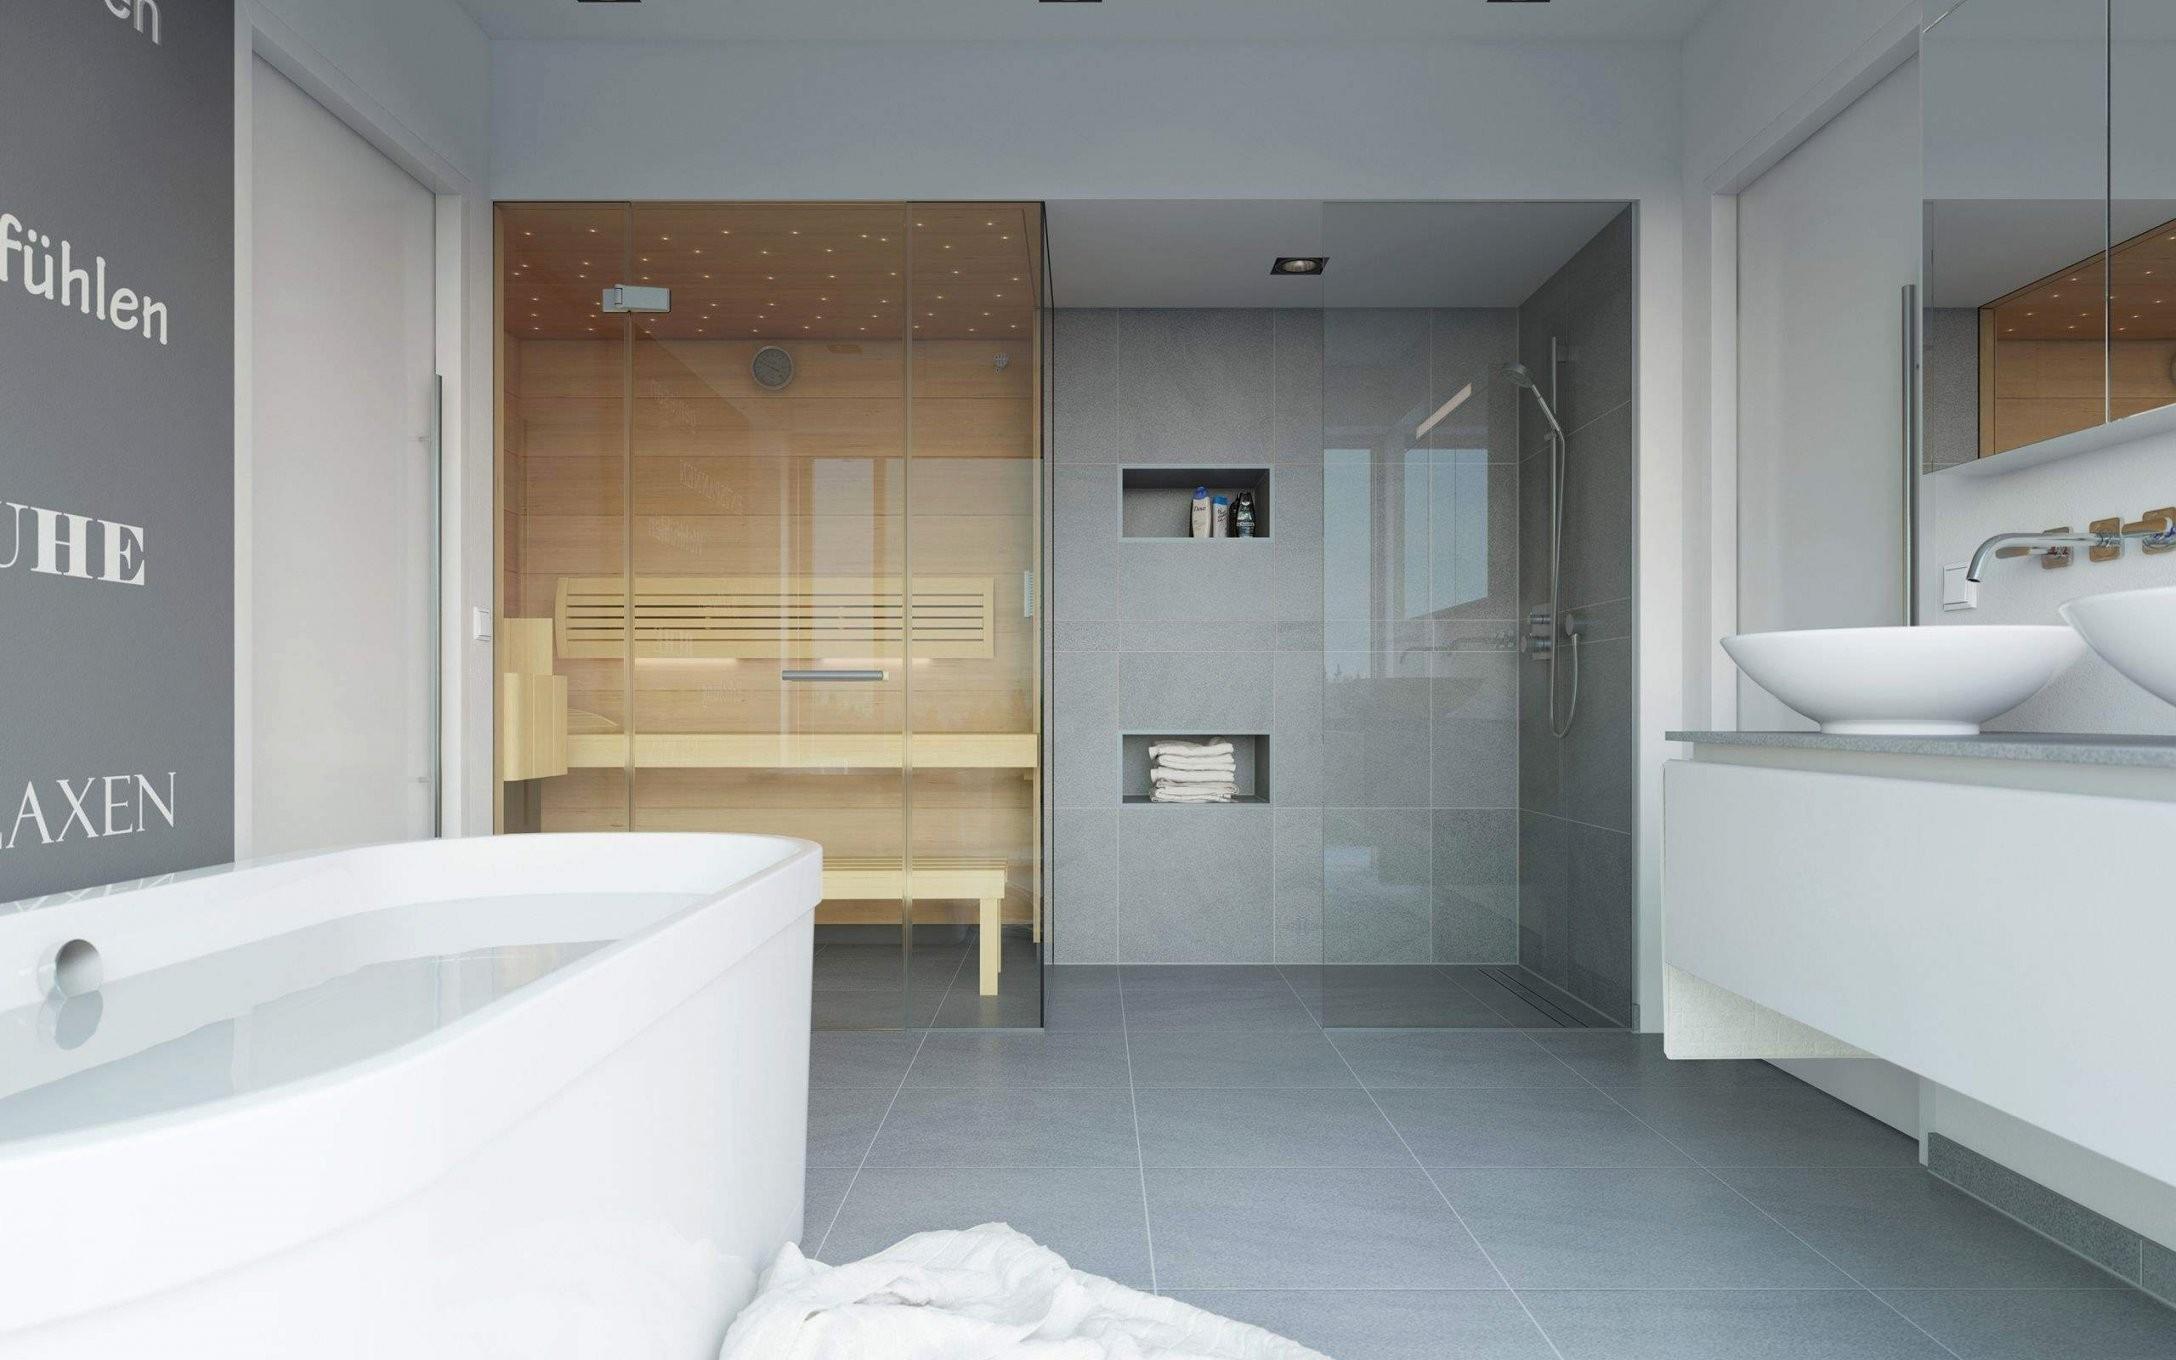 Ideen Bad Elegant Neu Wellness Badezimmer Schöpfung Badplanung von Wellness Badezimmer Ideen Photo